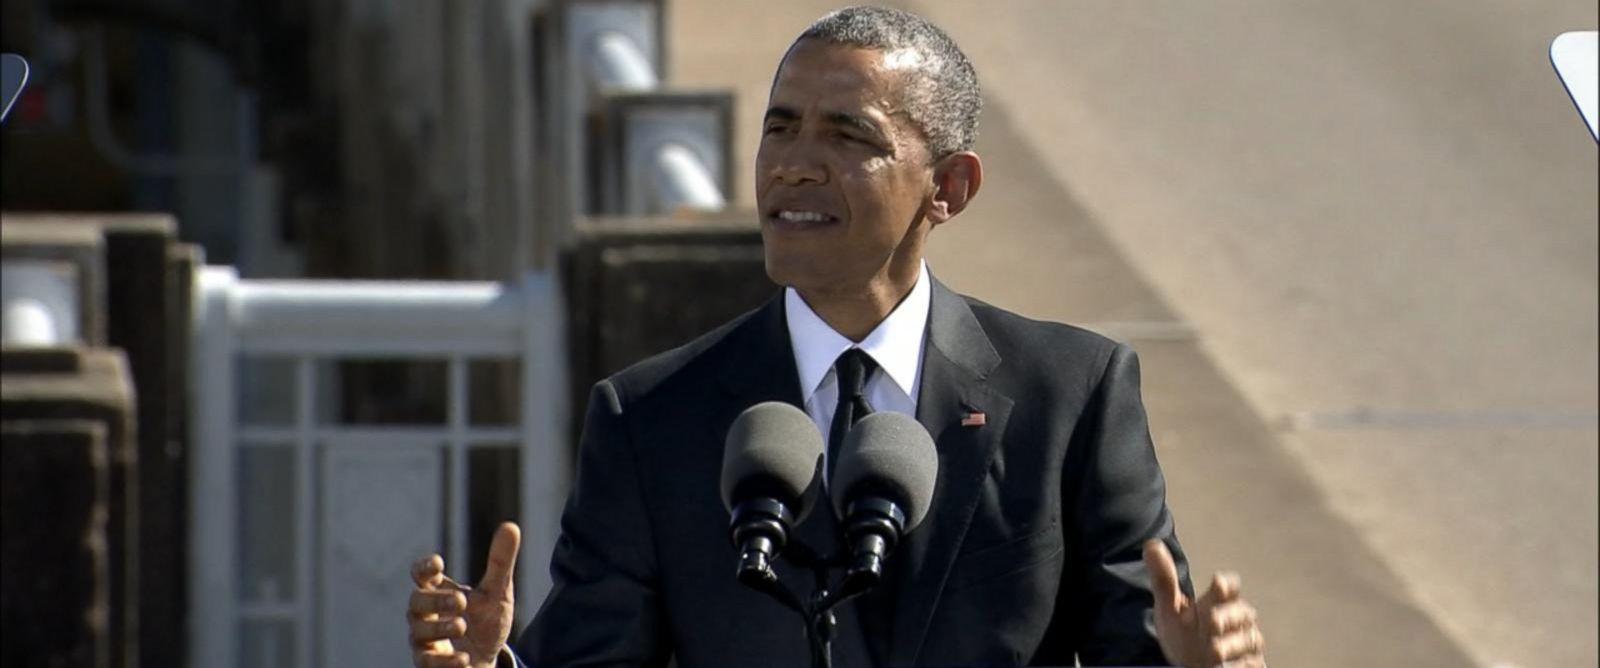 PHOTO: President Barack Obama delivers remarks at the Edmund Pettus Bridge in Selma, Ala., March 7, 2015.